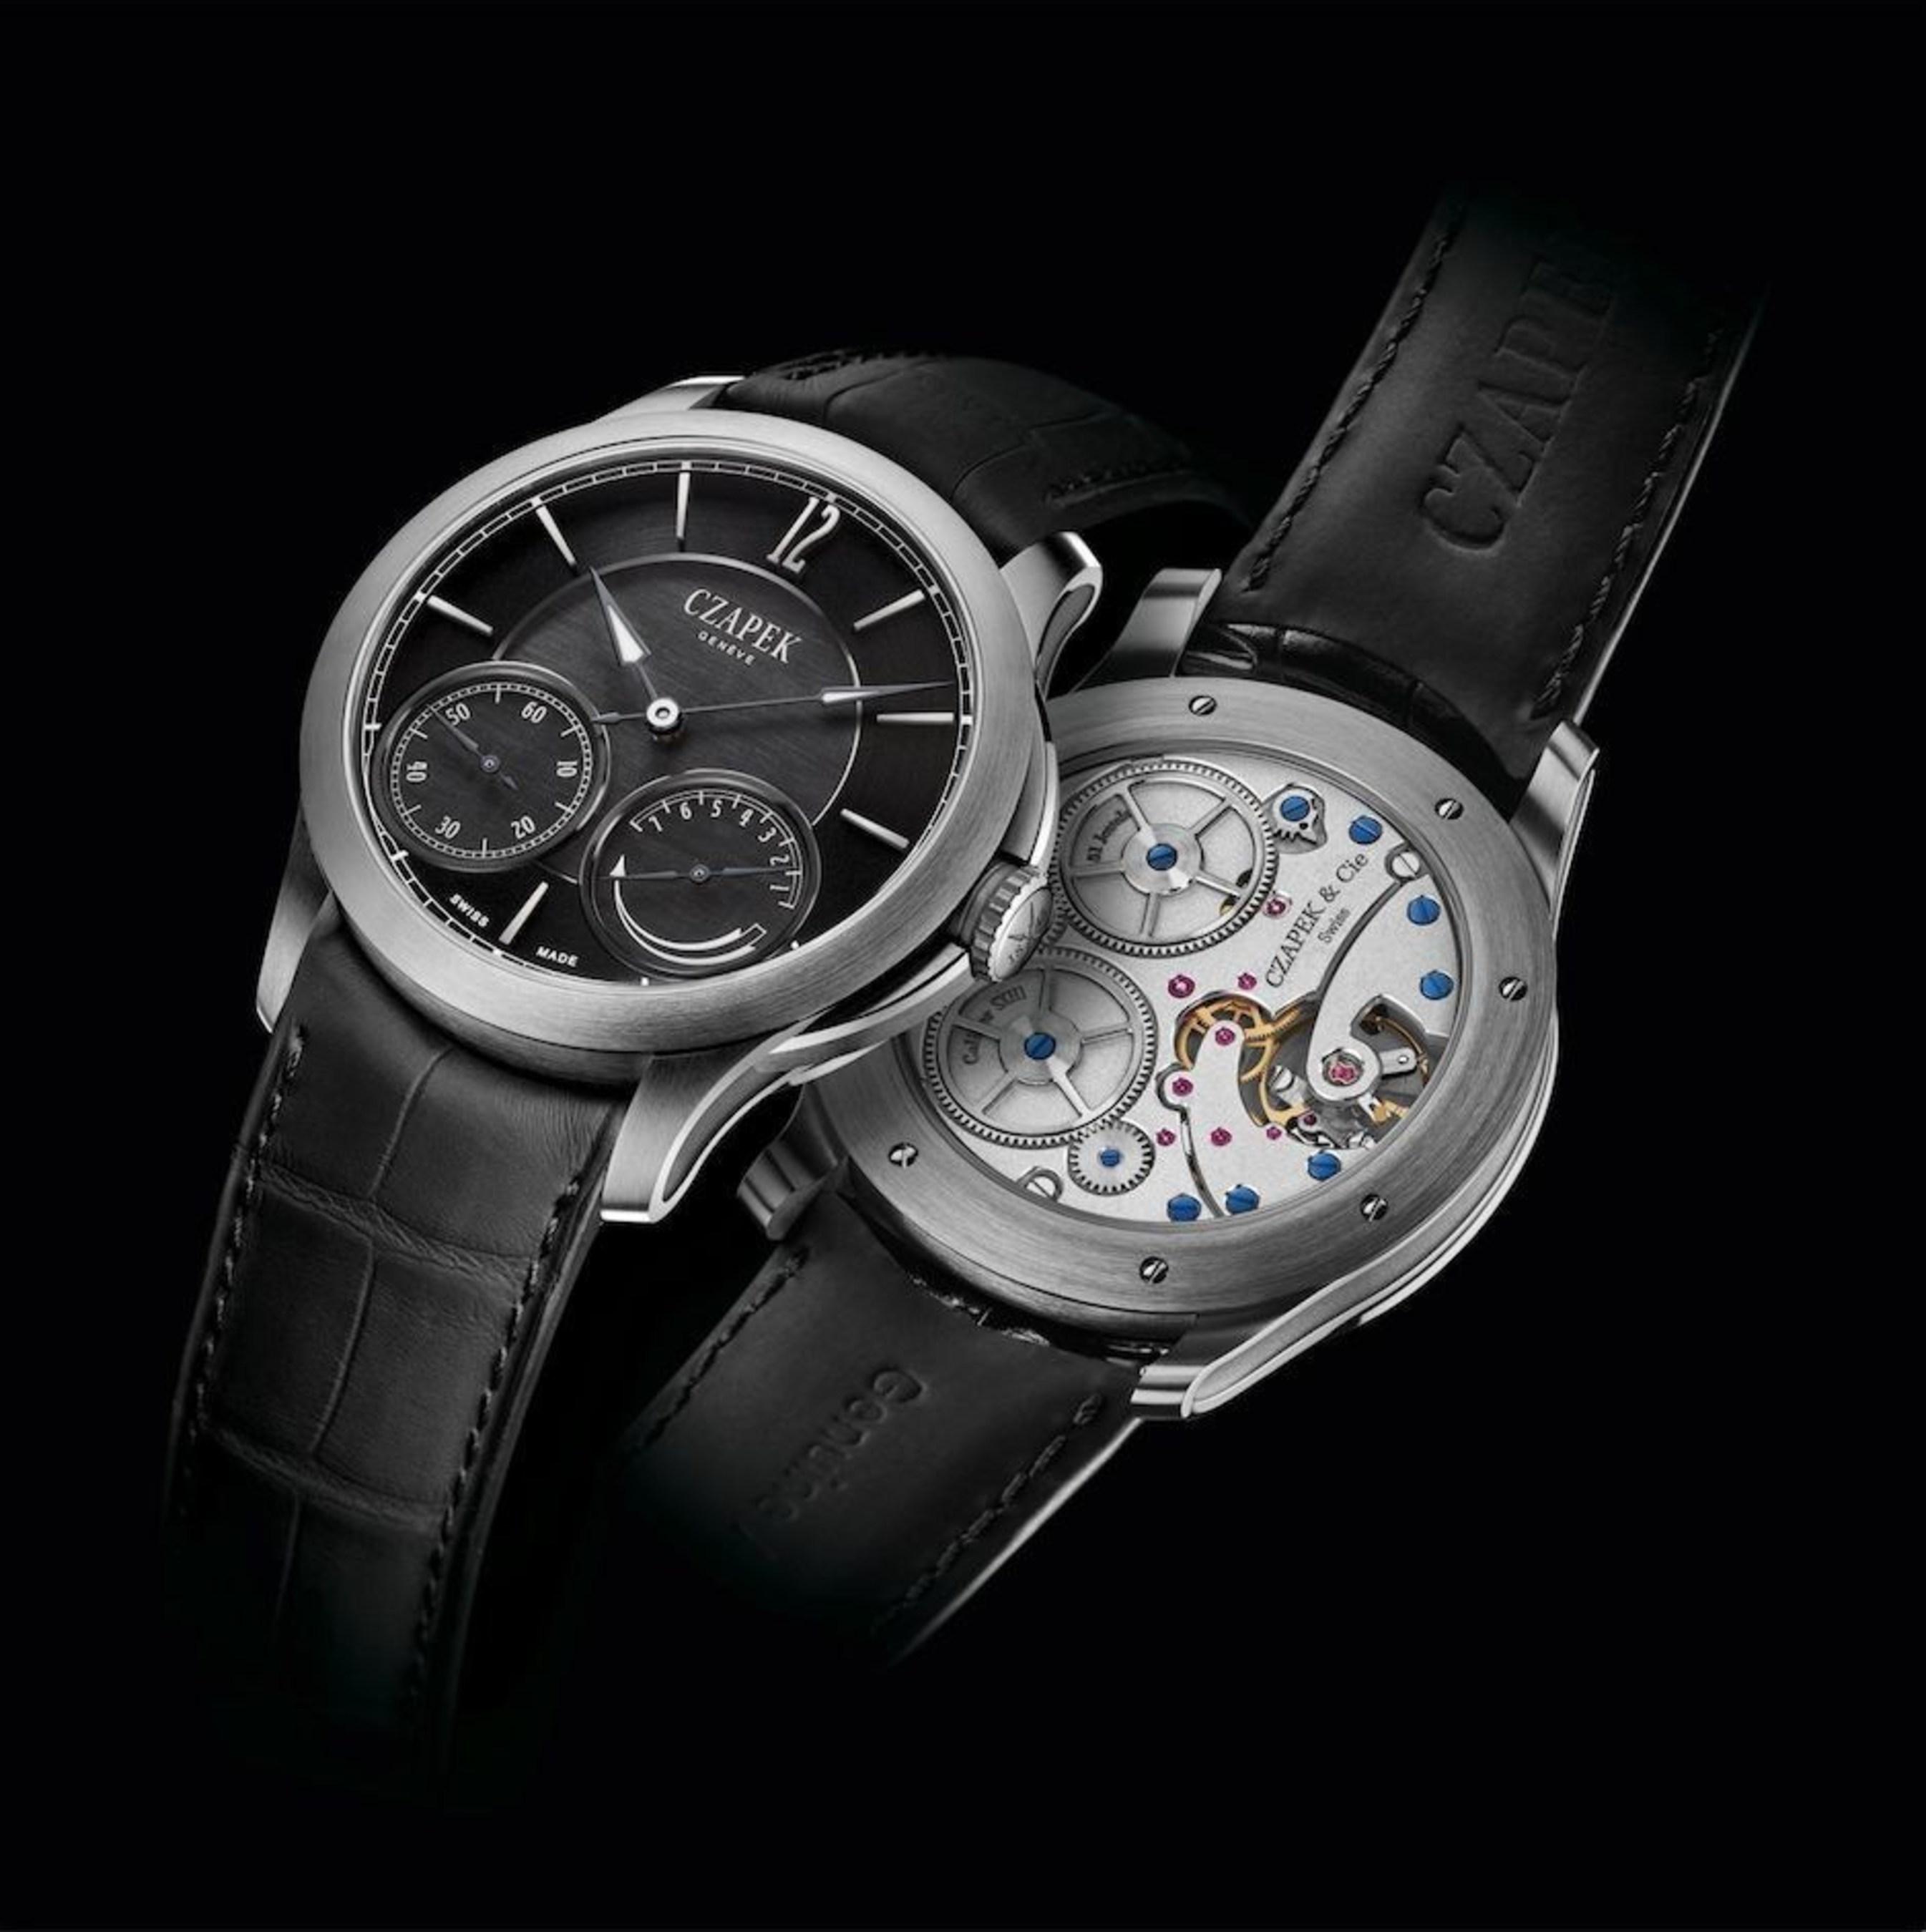 Czapek & Cie, the Return of a Fascinating Nineteenth Century Swiss Watch Company